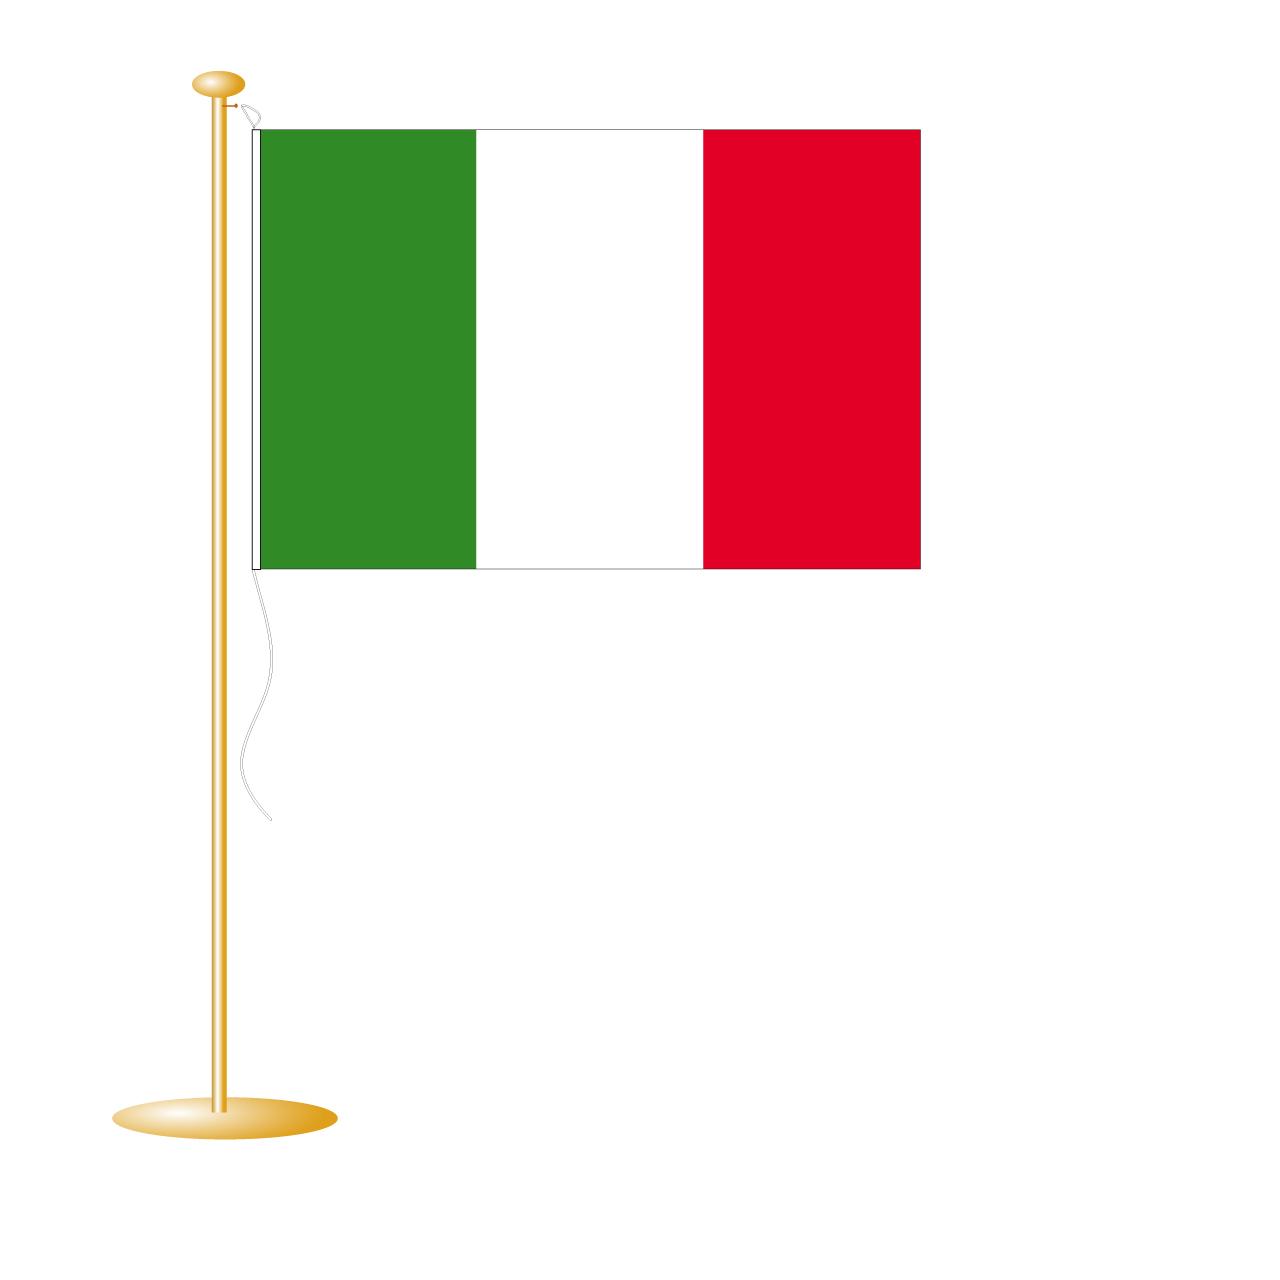 Tafelvlag Italië afm. 10x15cm